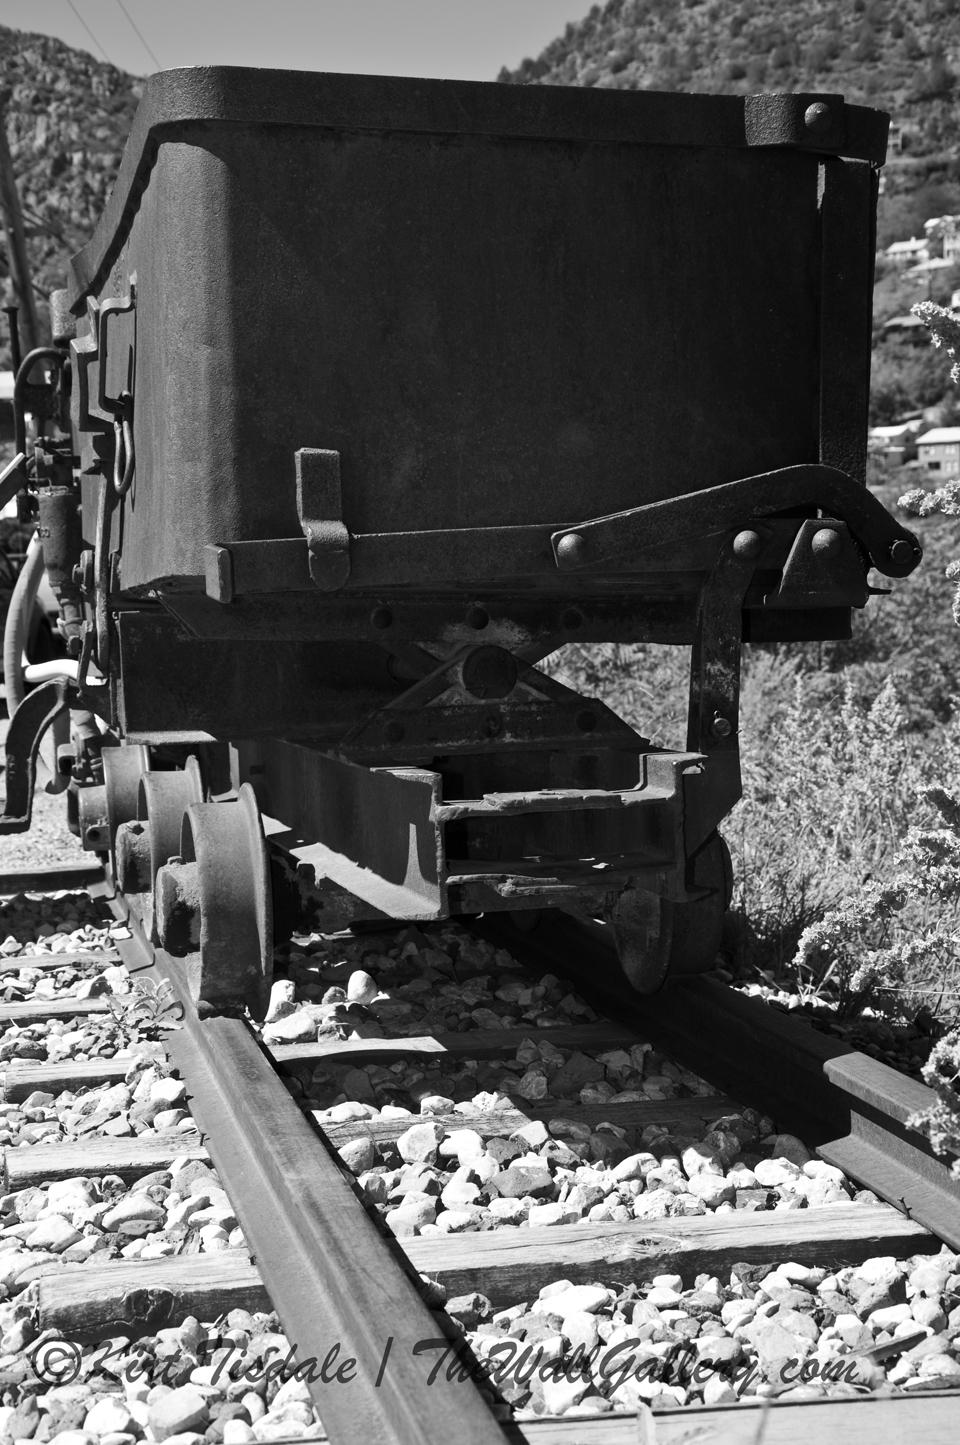 Mining Cart - Black and White